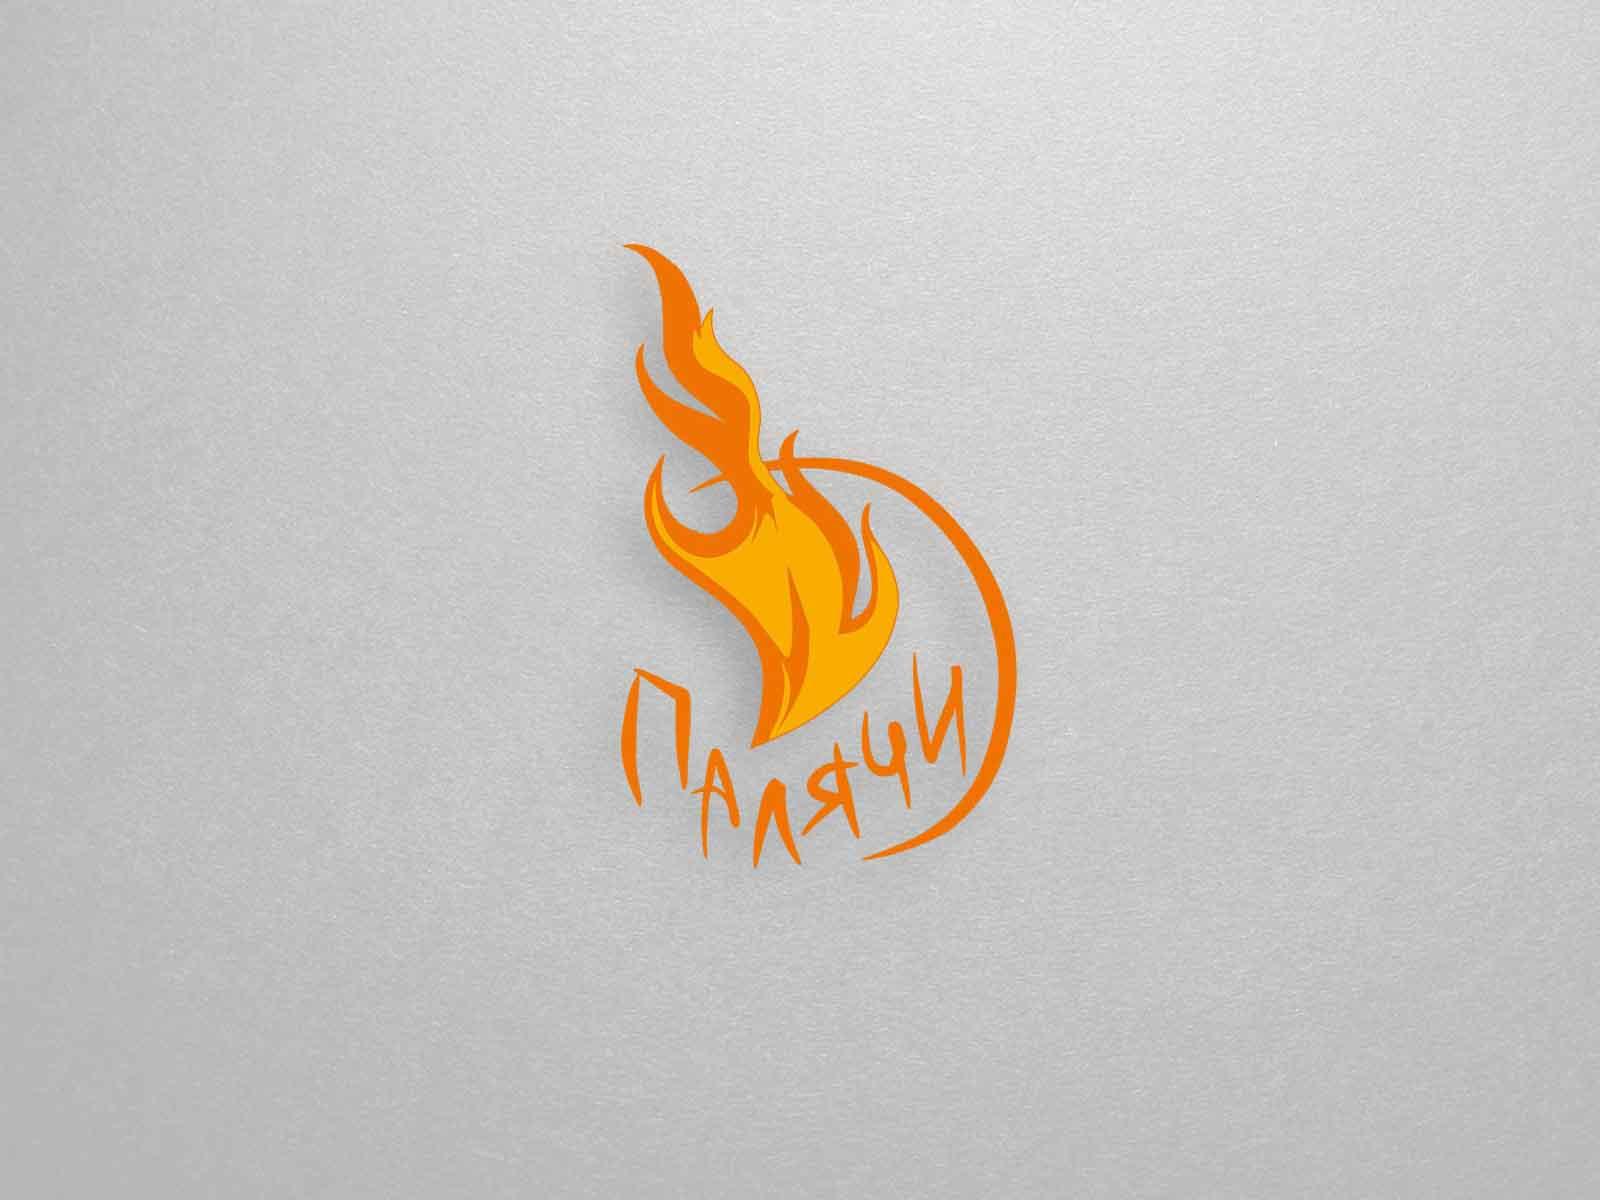 palyachi-logo2